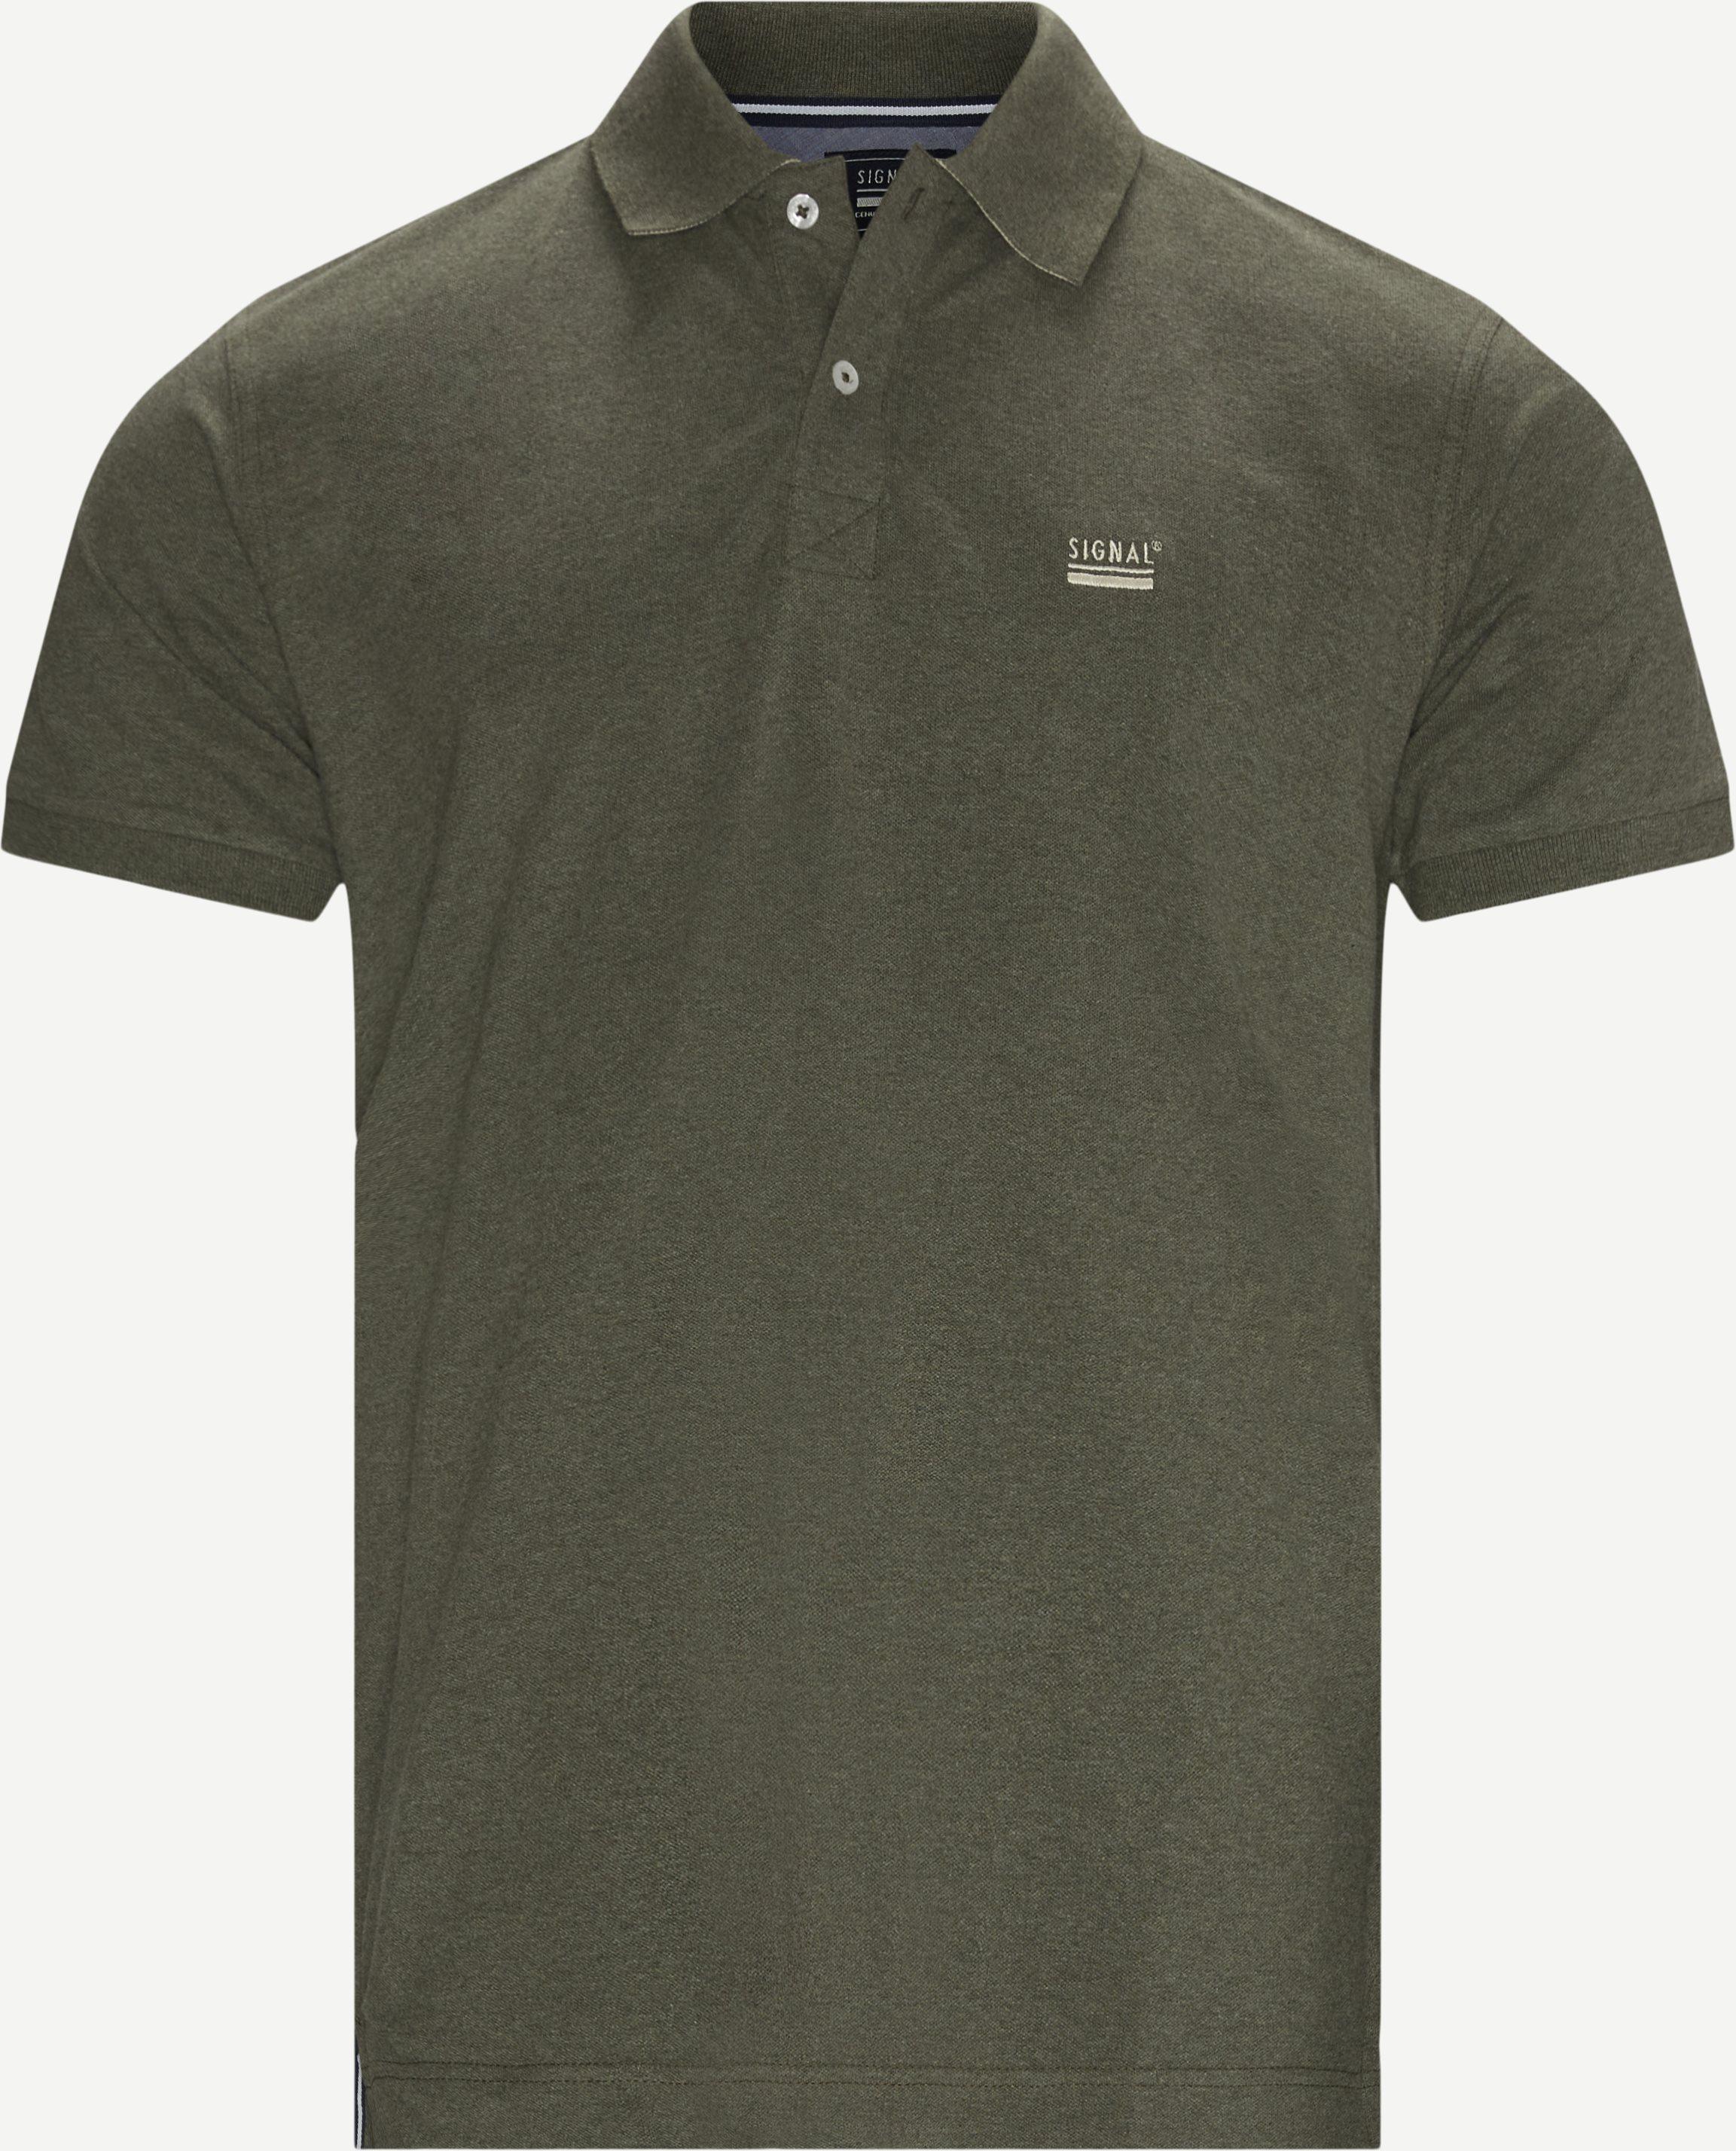 Nors Polo T-shirt - T-shirts - Regular - Army